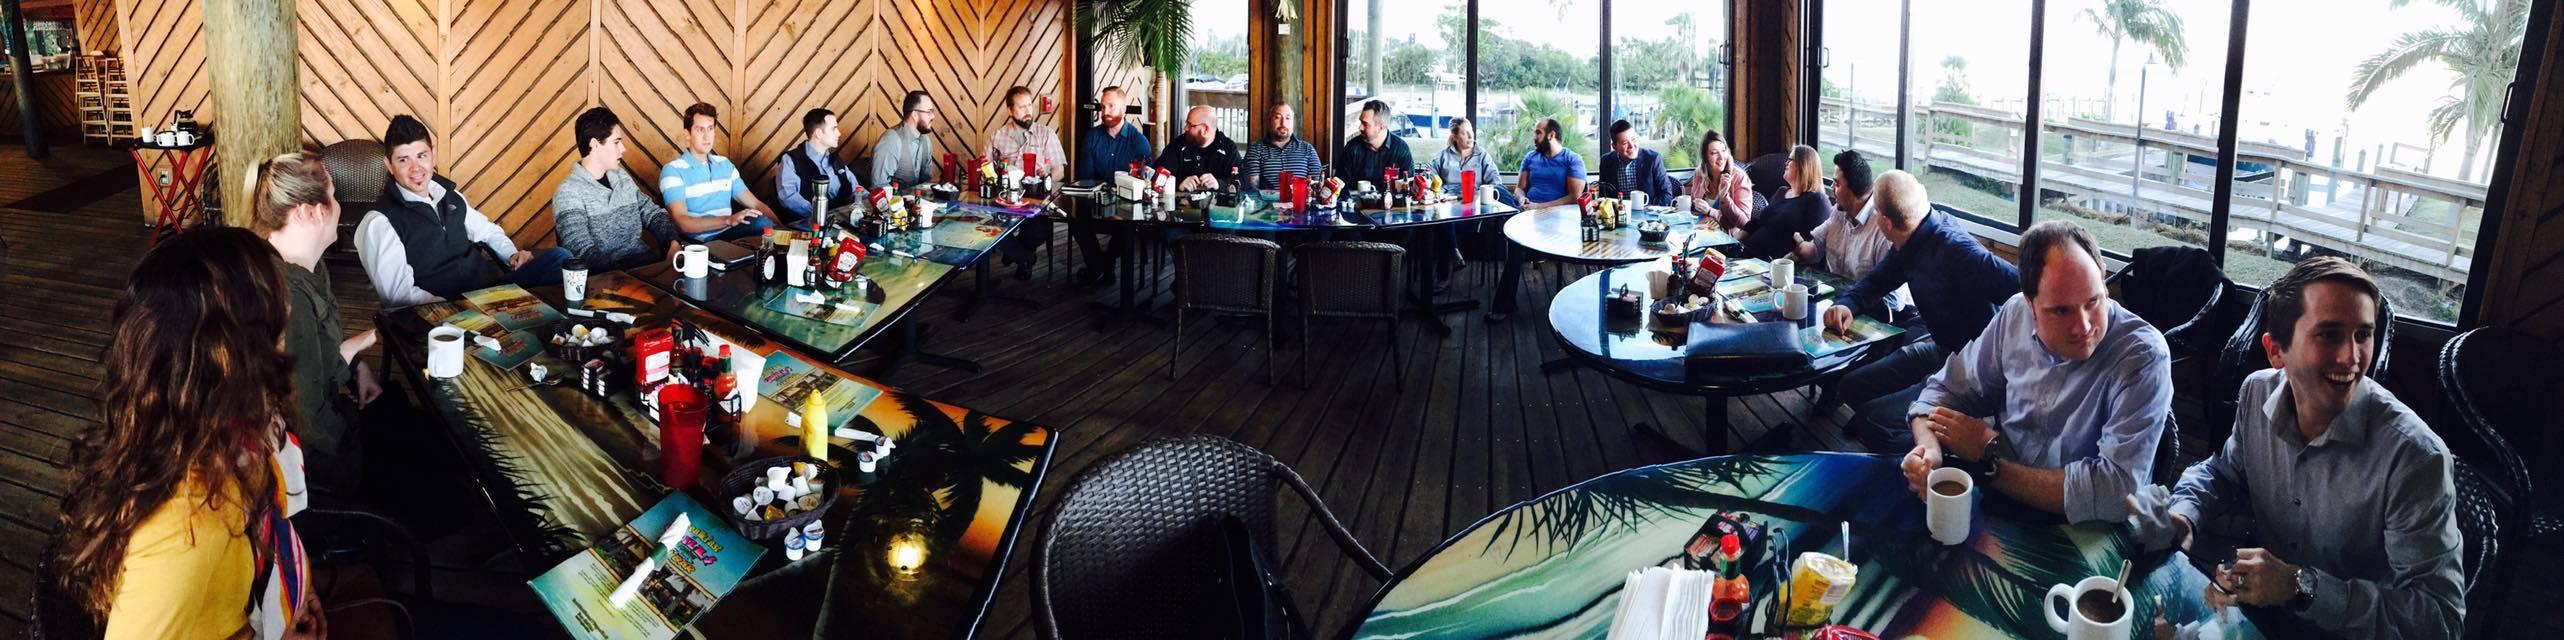 Grills Morning Meeting